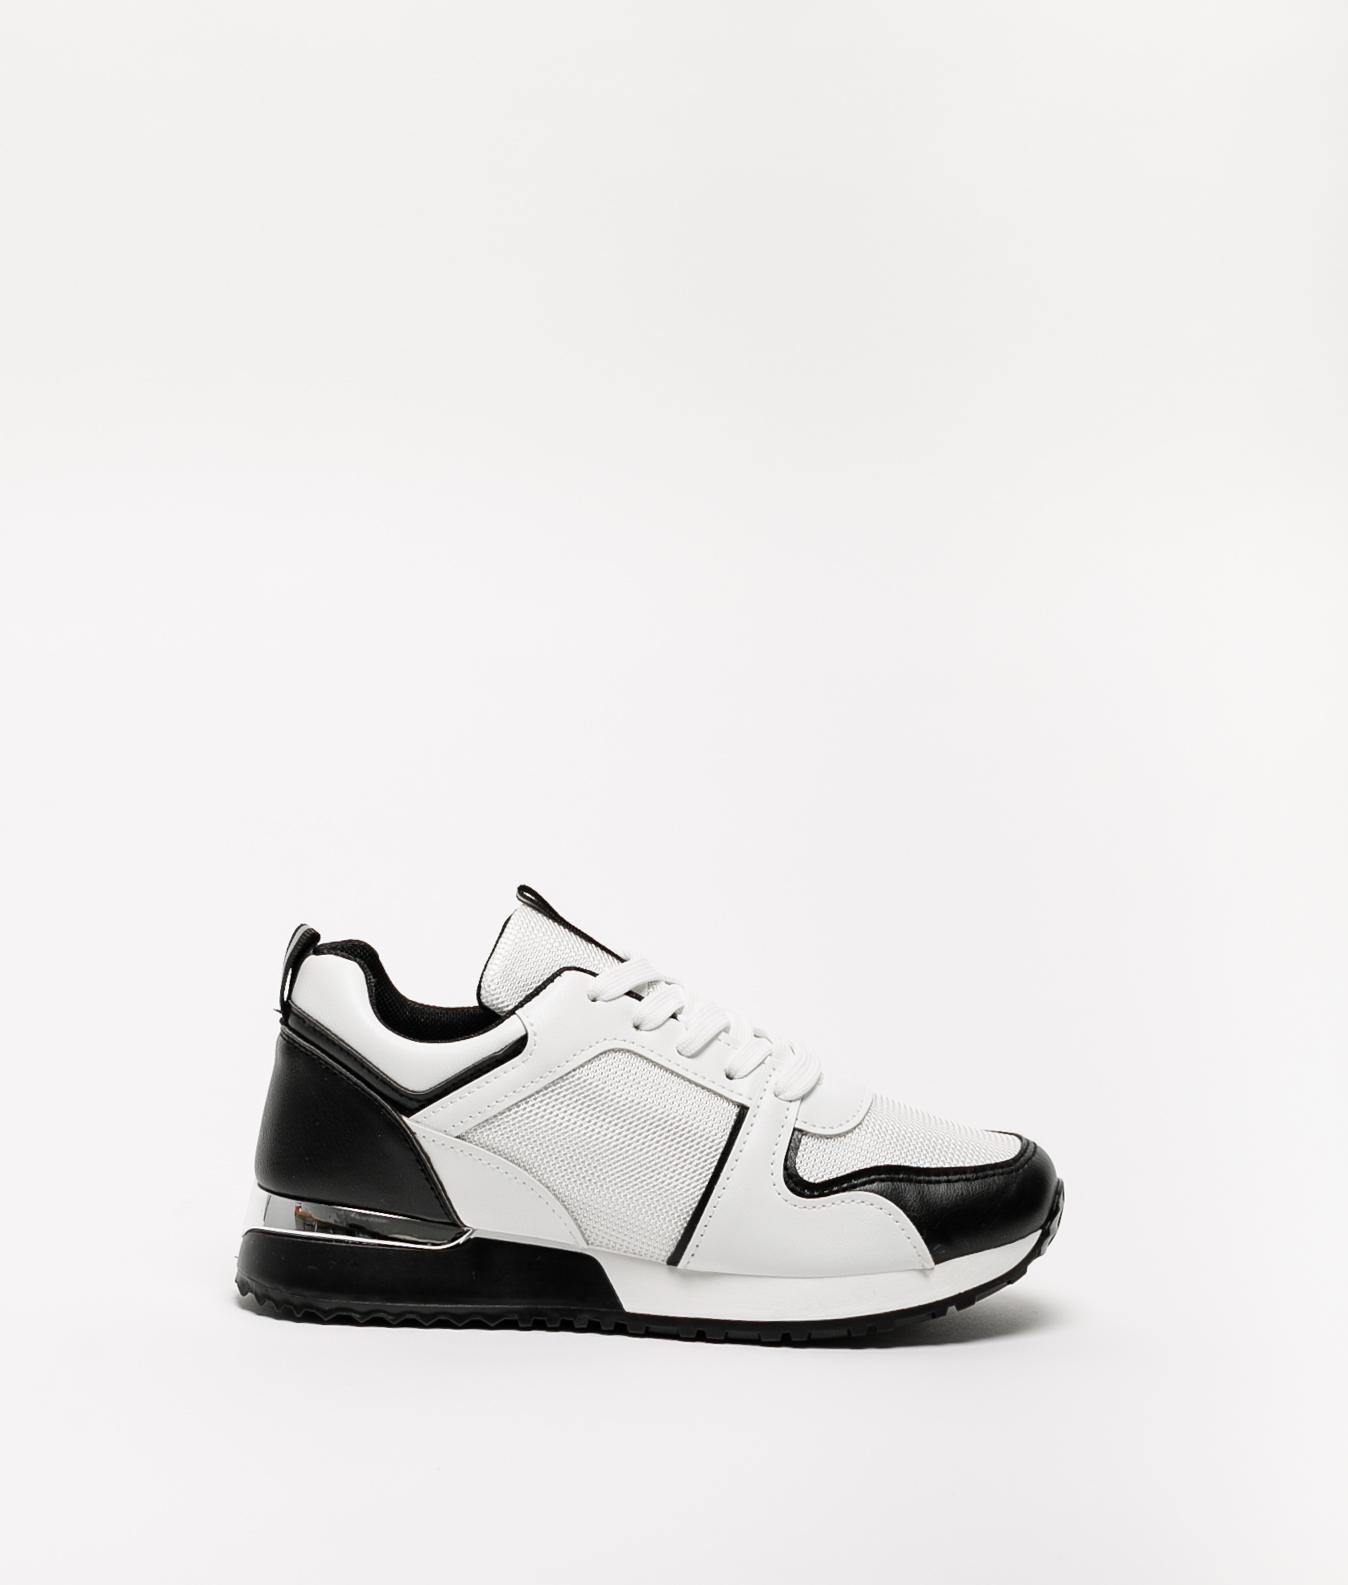 Sneakers Marot - Preto